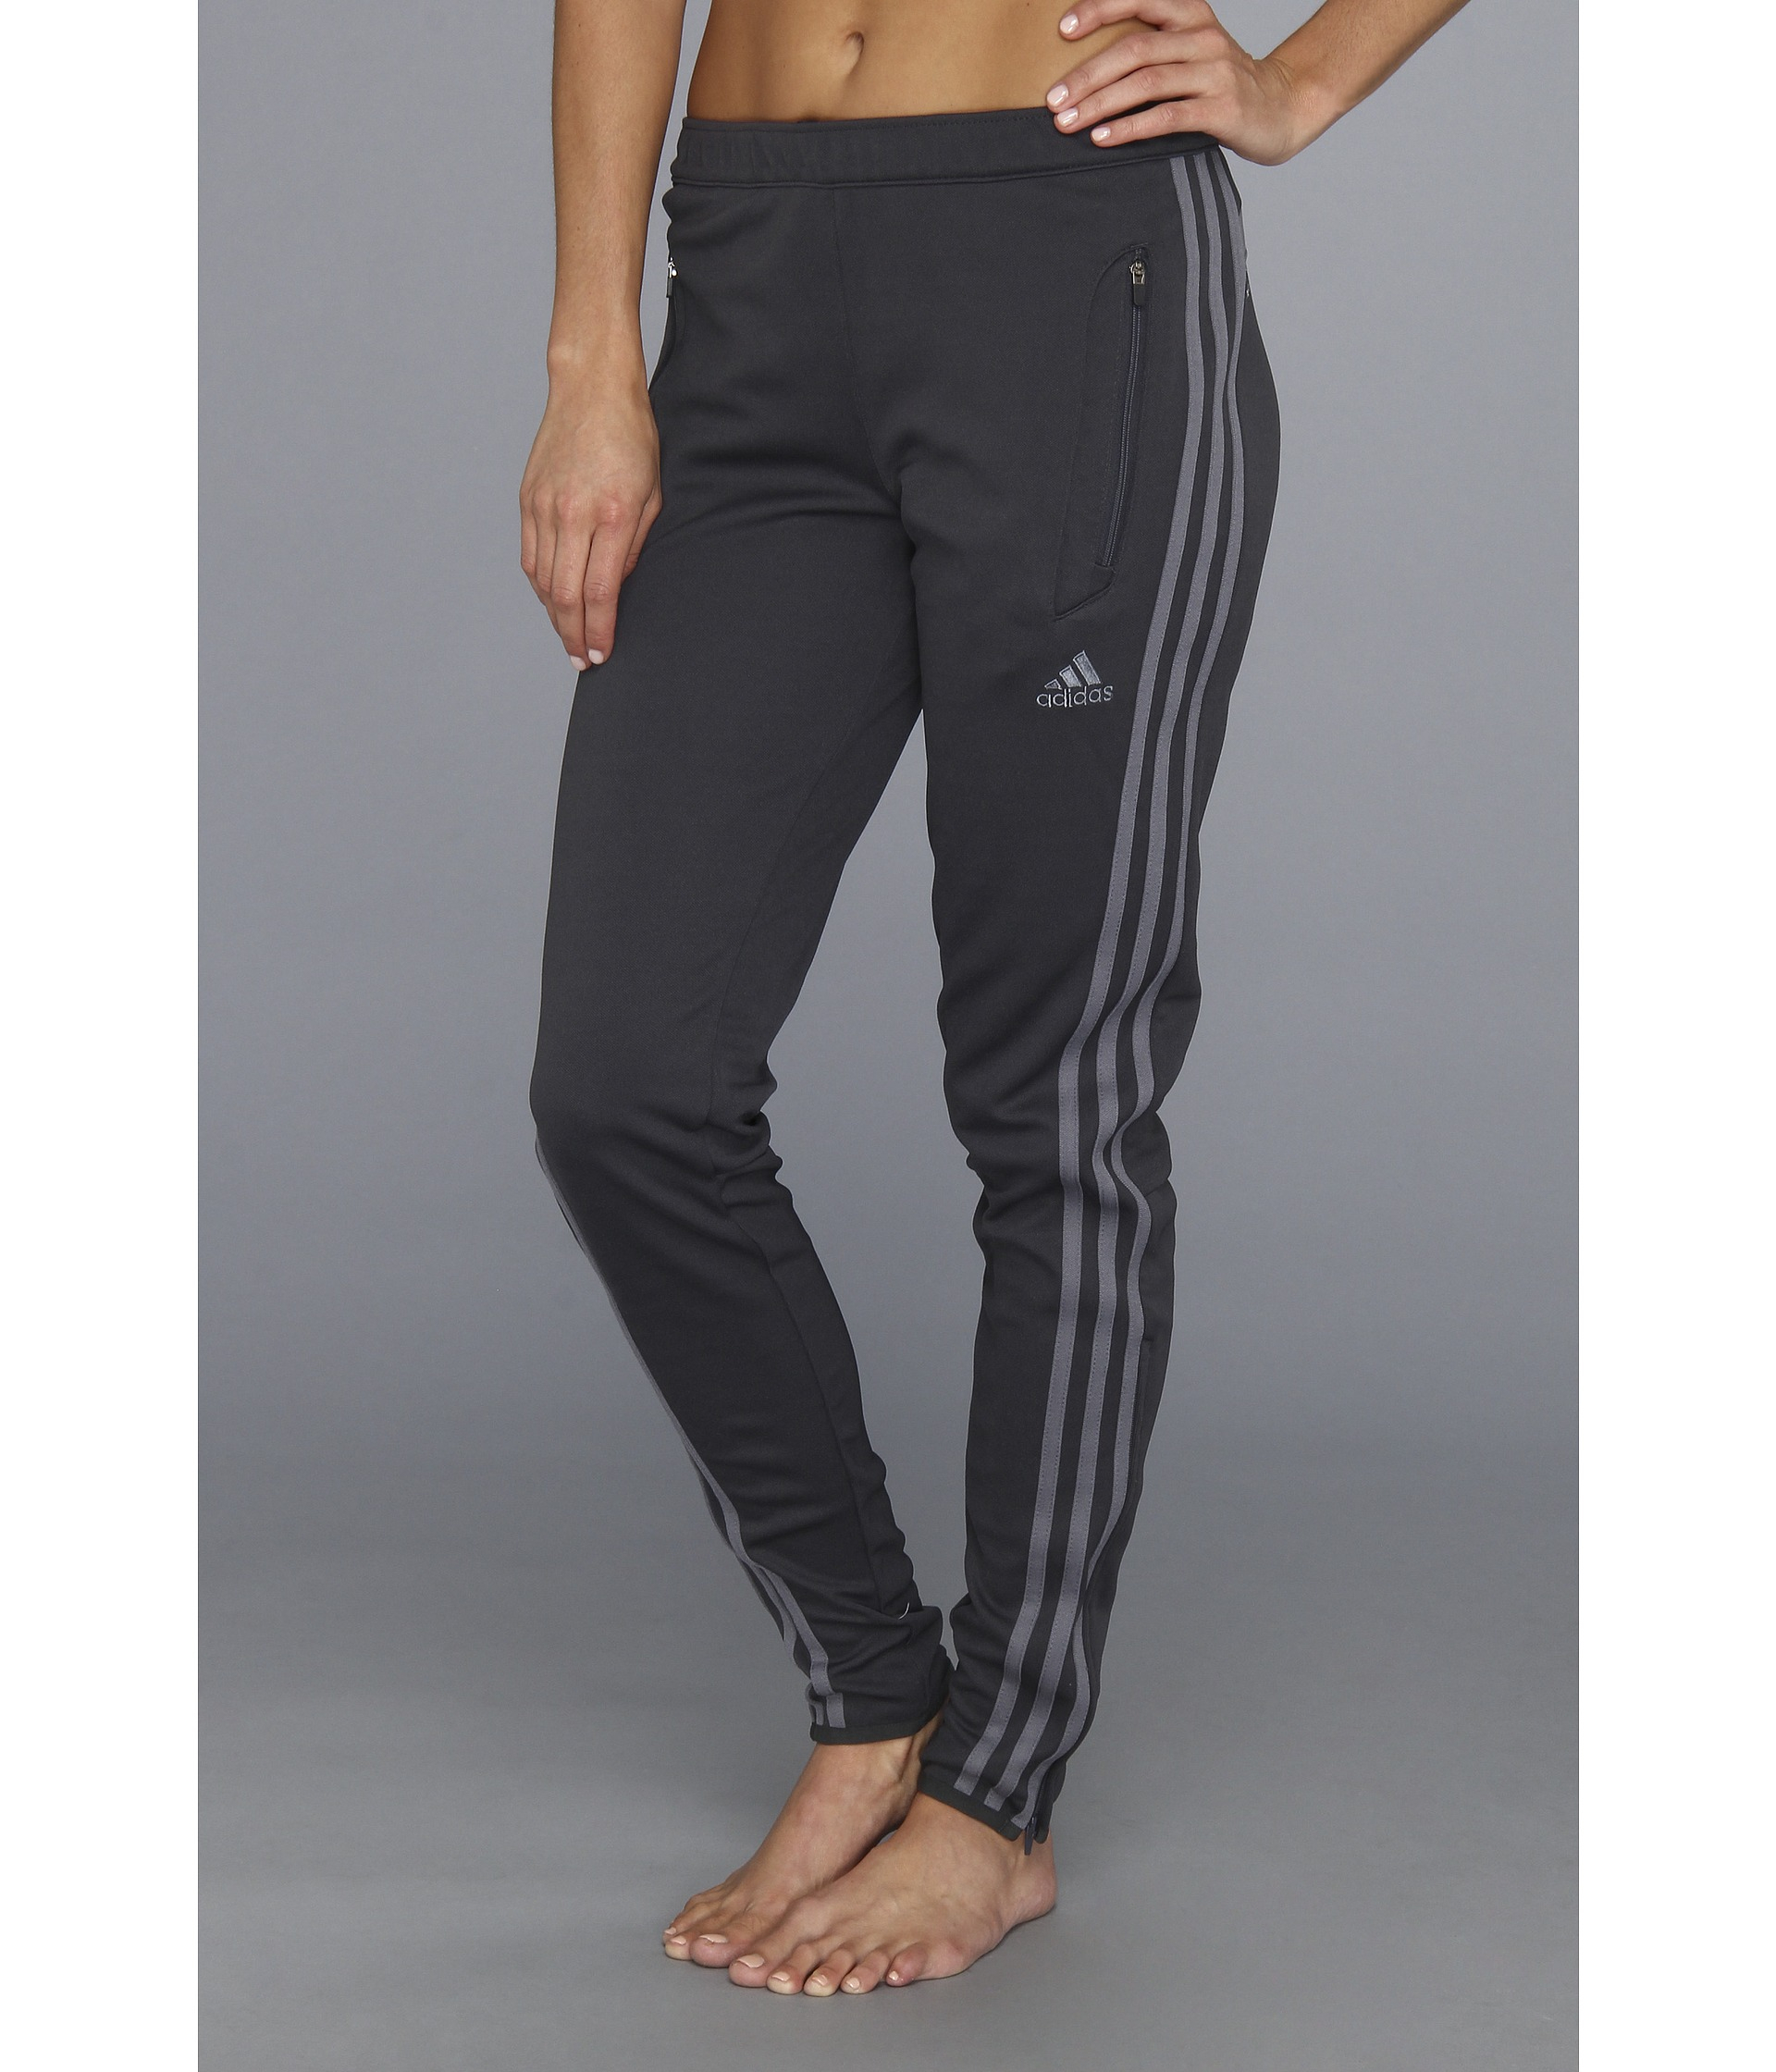 Elegant  Adidas Pants On Pinterest  Adidas Shorts Adidas And Soccer Pants